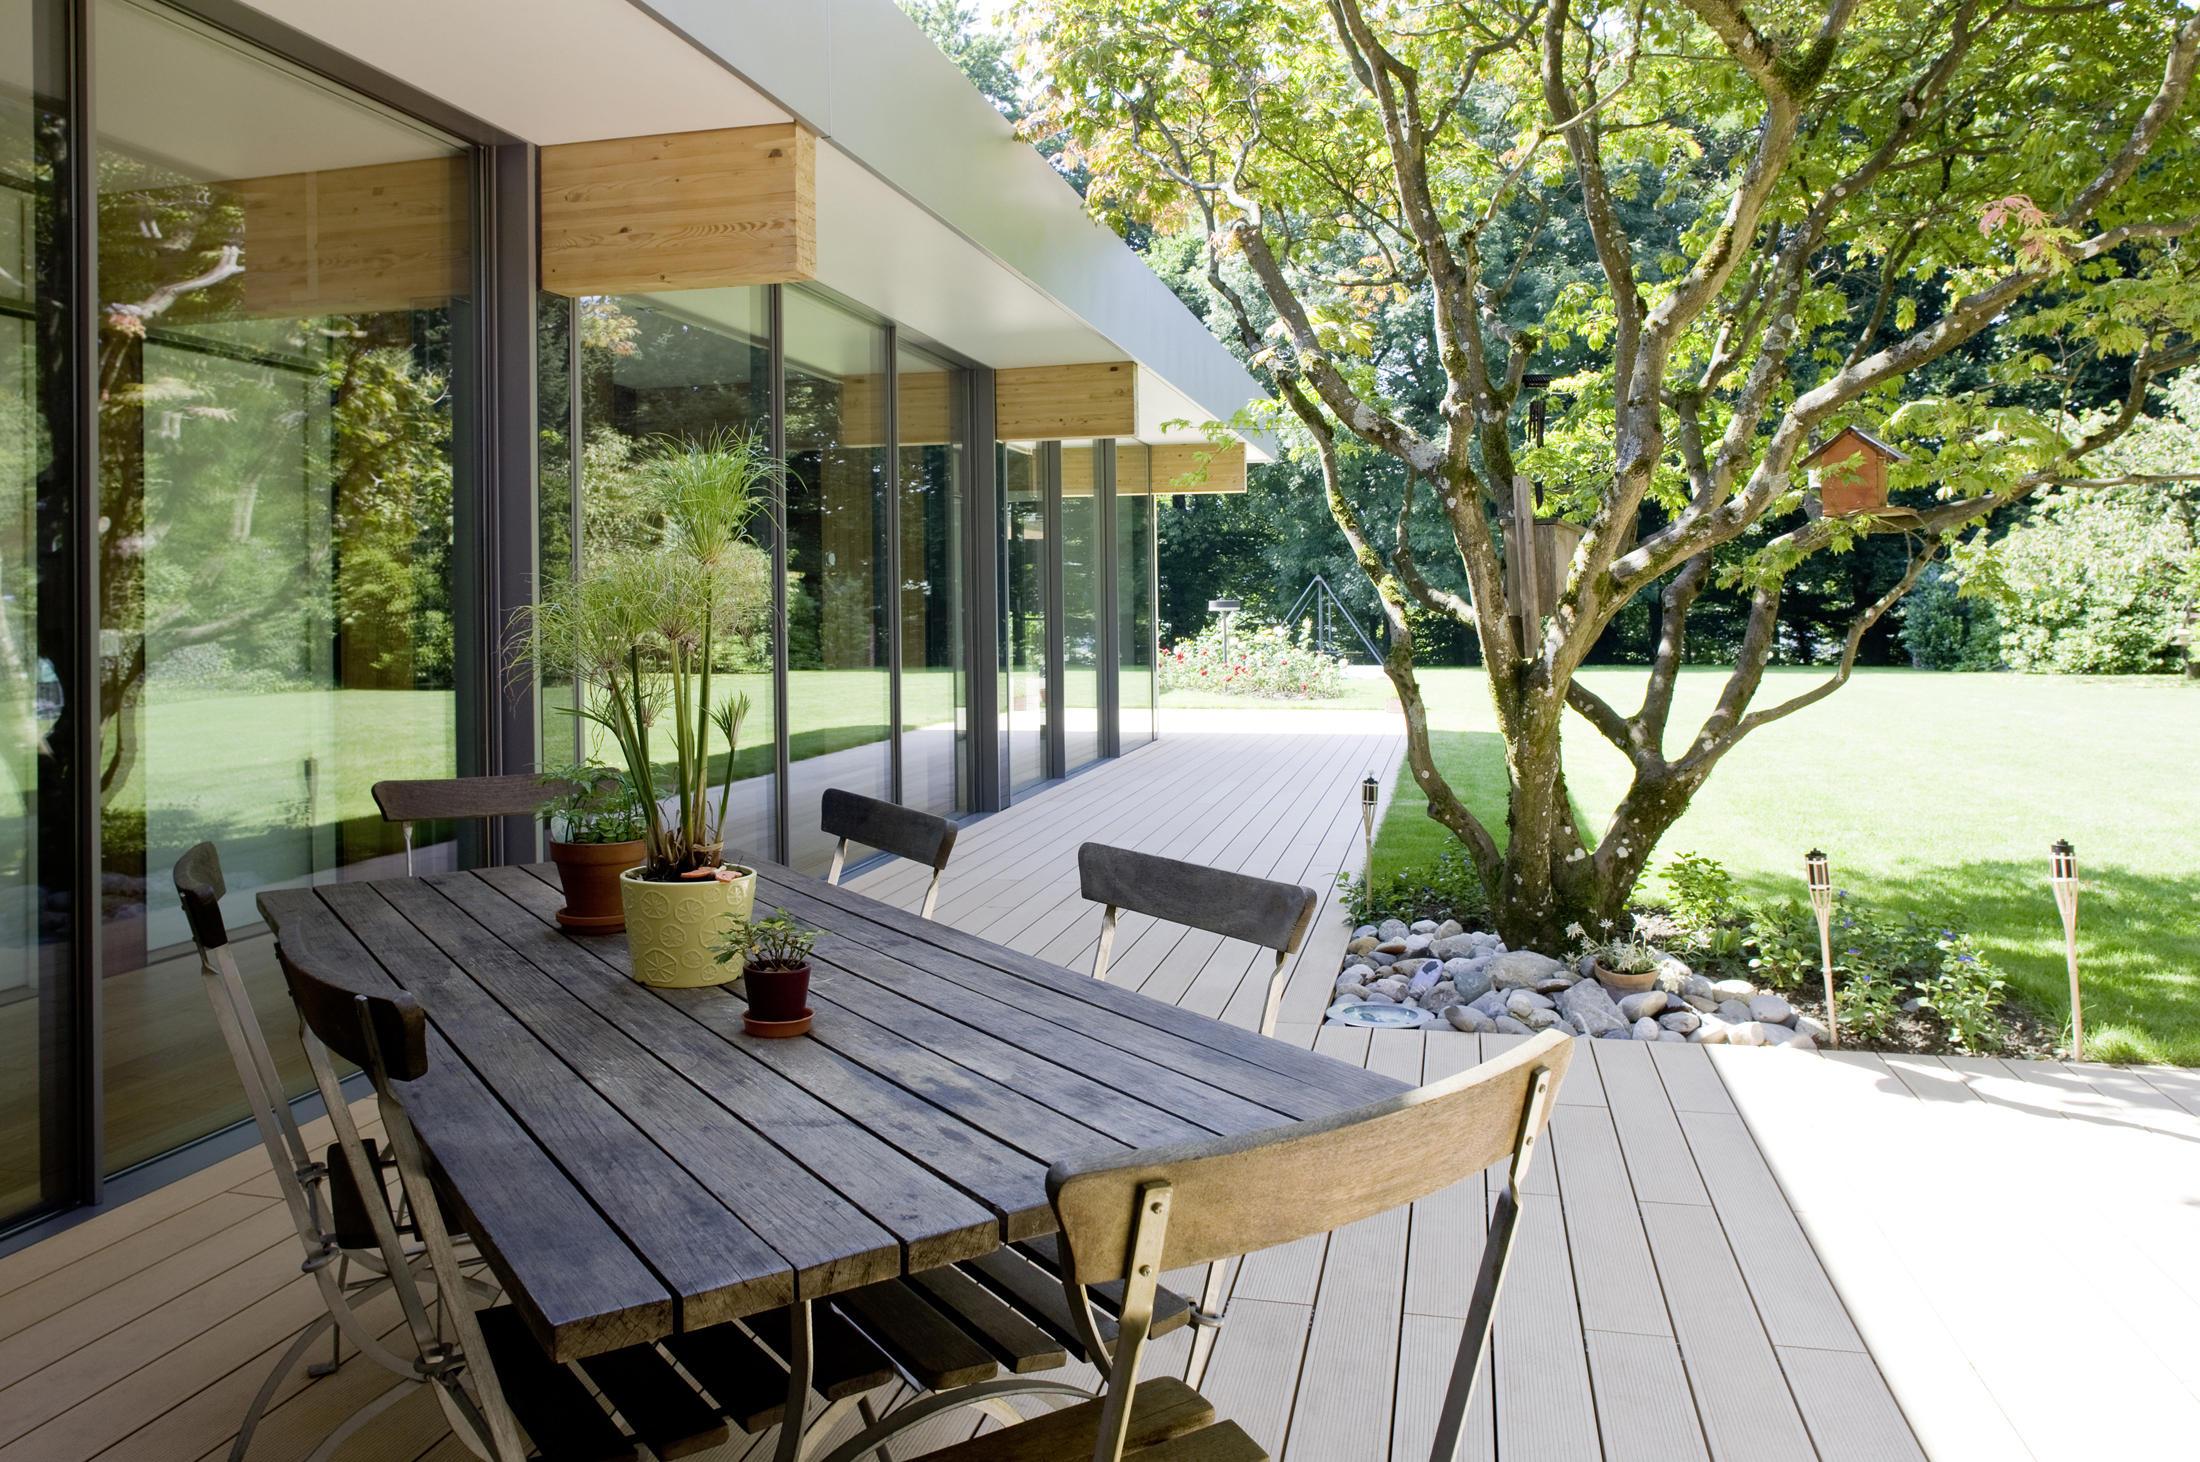 relazzo ambra bodenbel ge von rehau architonic. Black Bedroom Furniture Sets. Home Design Ideas